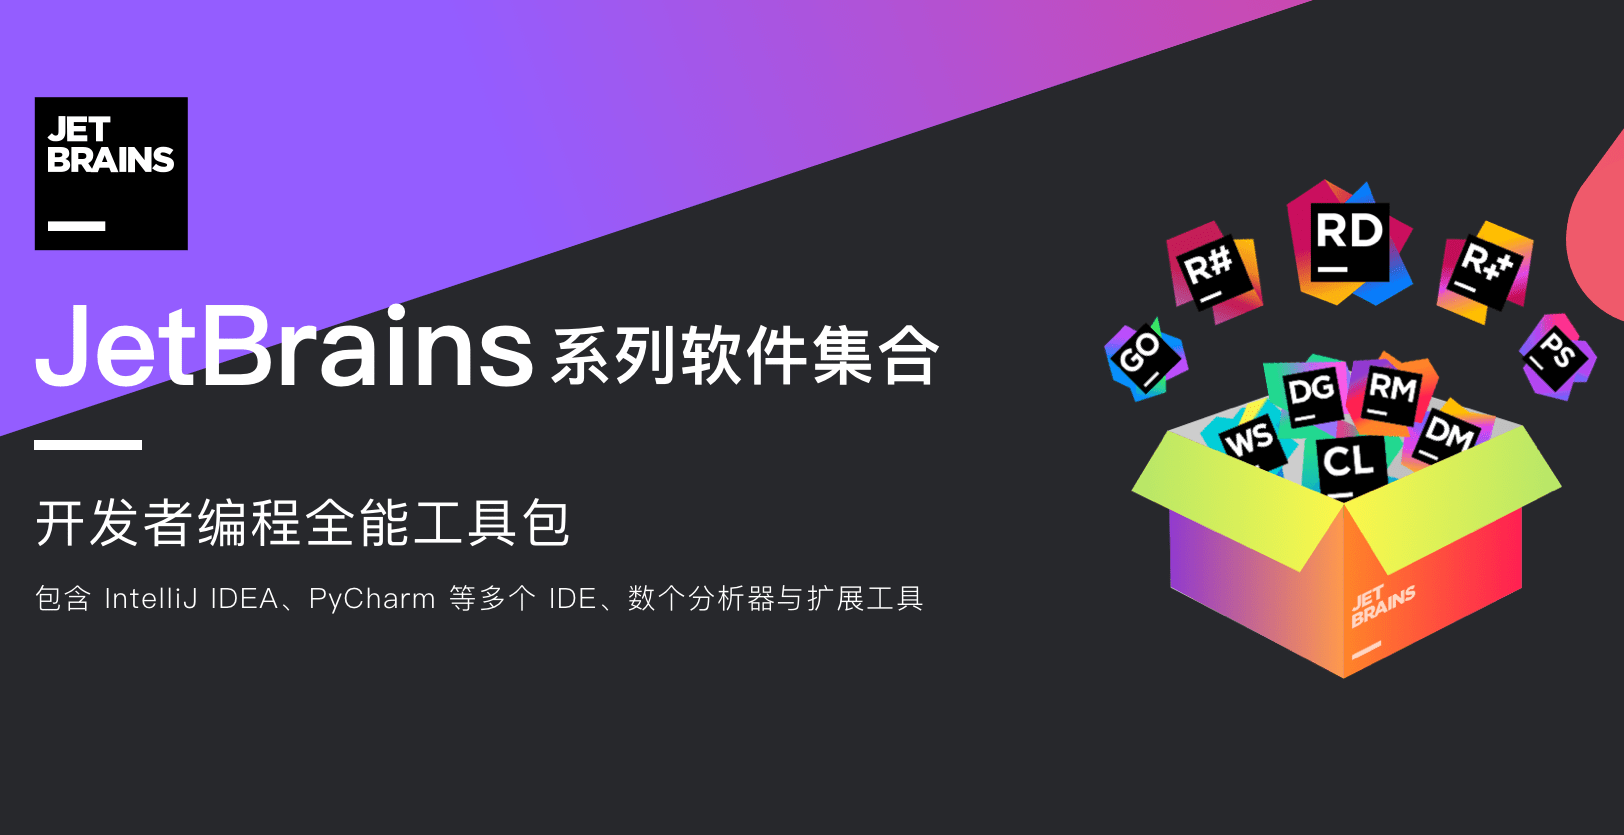 JetBrains(各系列开发工具)v2020.10.17 通用激活破解补丁